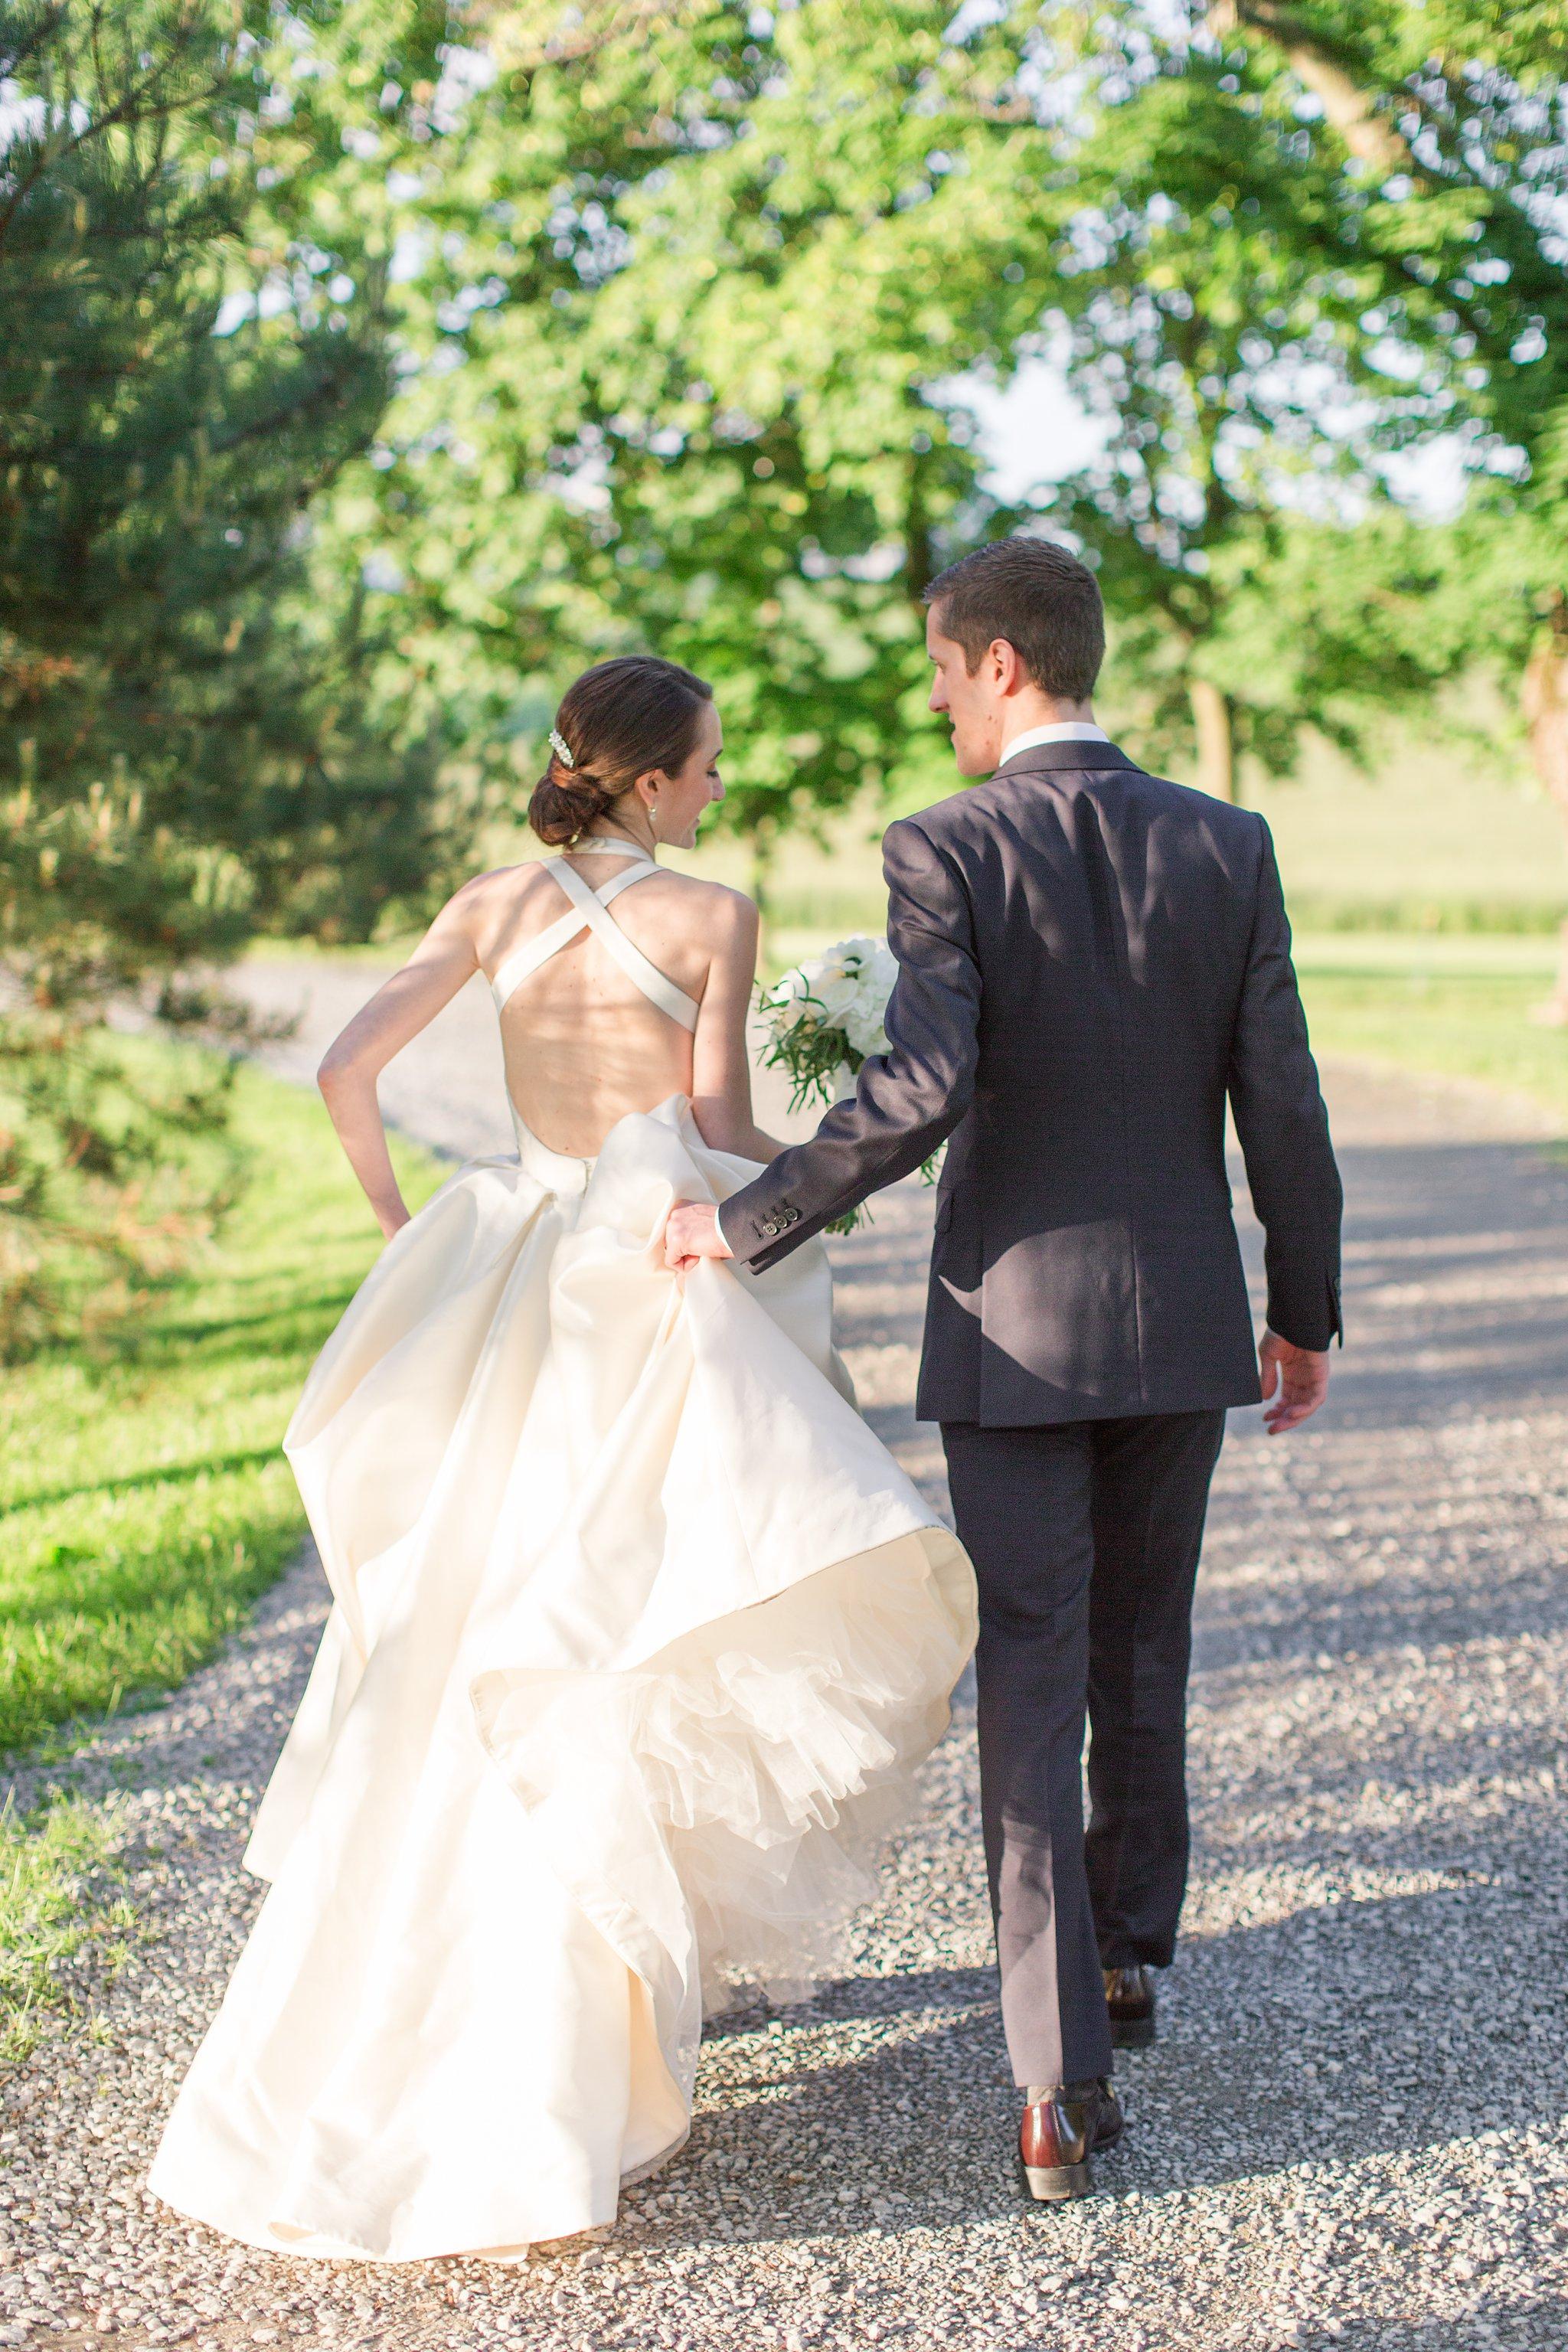 Lauren + Jeffrey on May 13, 2017 ♥ Megan Kelsey Photography at Whitehall Manor (Bluemont, VA)